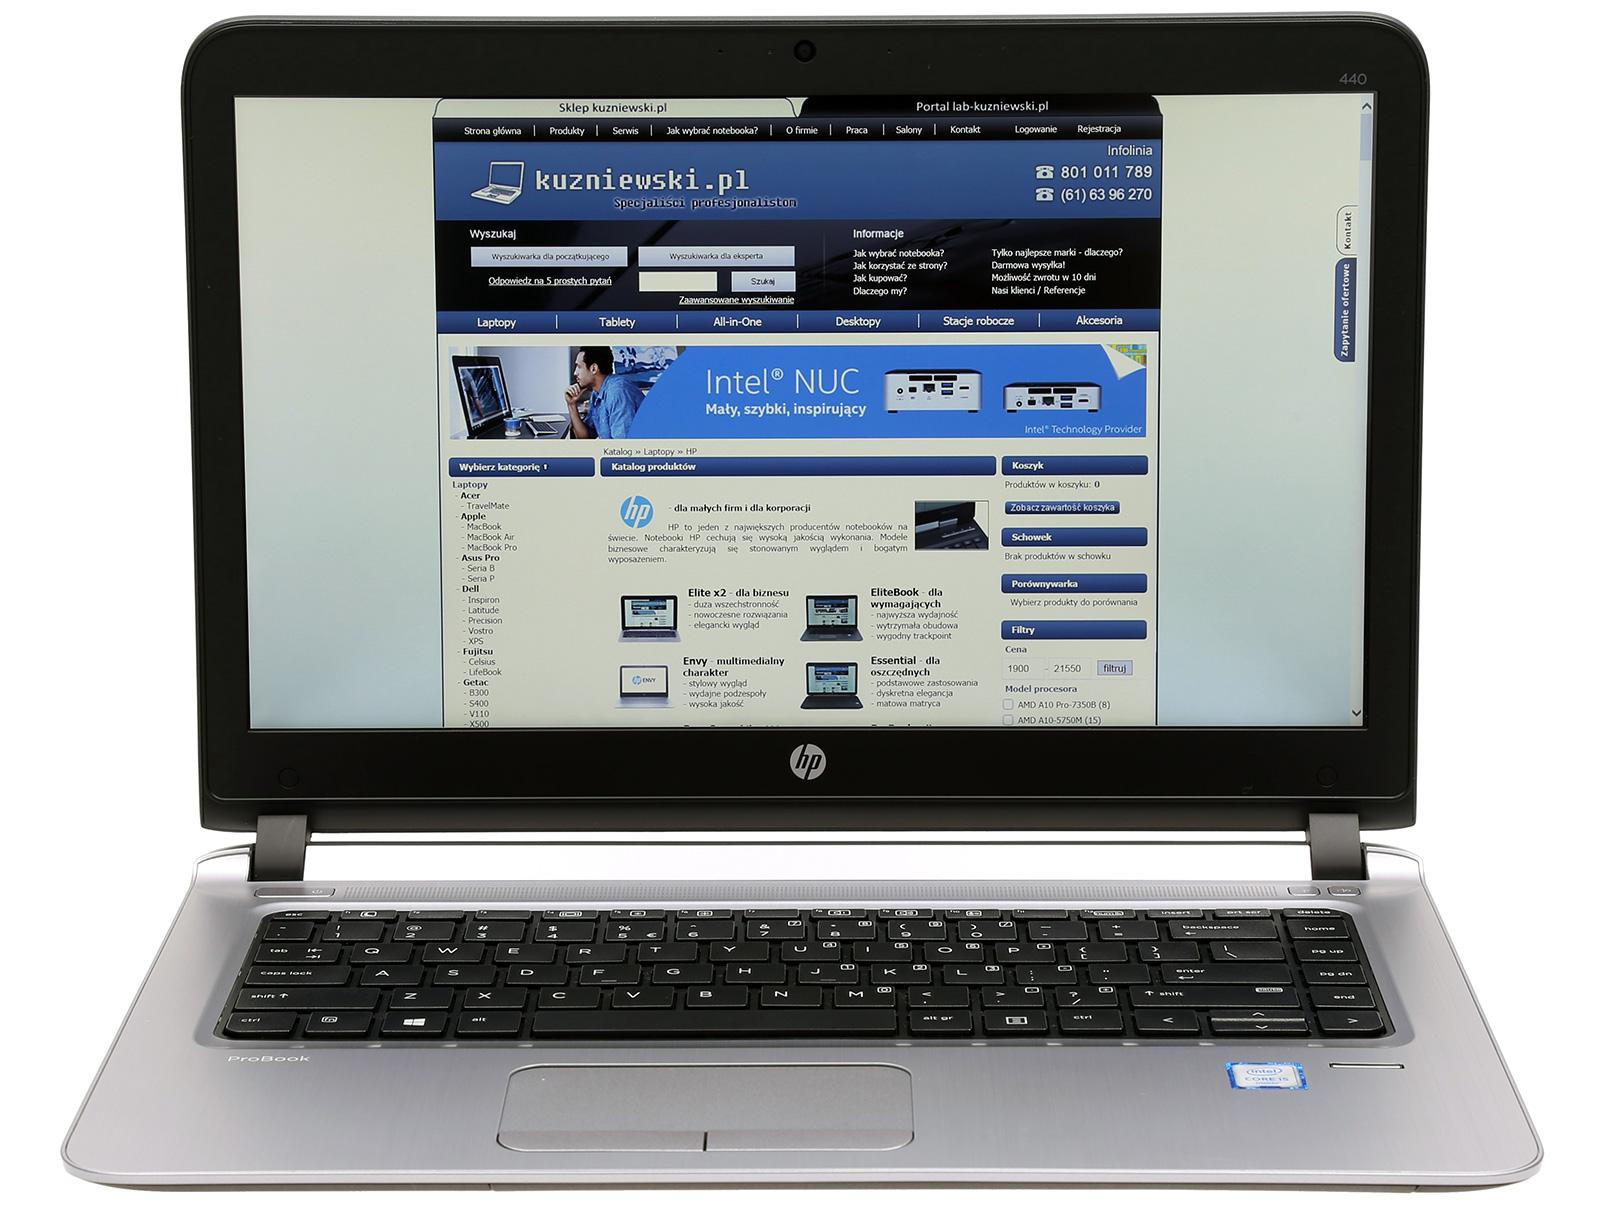 "HP ProBook 440 G3 P5R31EA Intel Core i3 6100U 14 1"" HD 4 GB 500 GB HDD Intel HD Graphics 520 Windows 10 Pro lub 7 Pro pakiet usług i wysyłka"